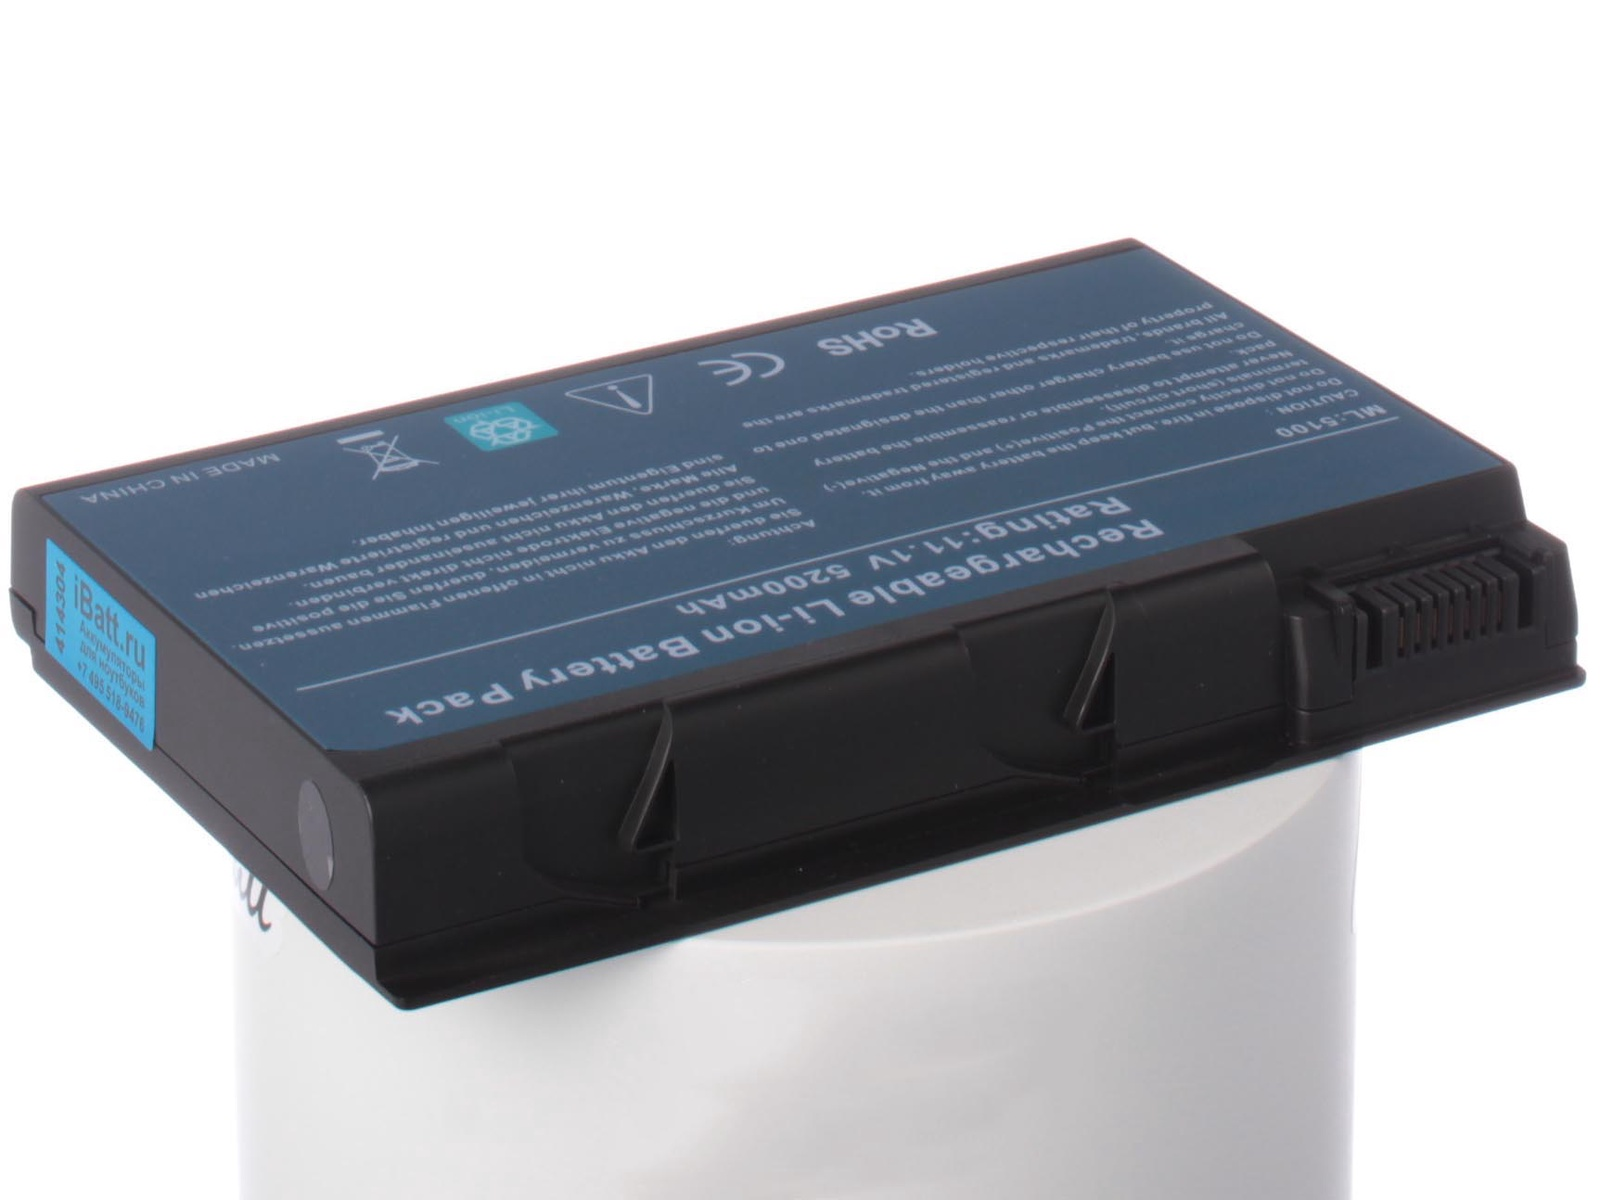 Аккумулятор для ноутбука iBatt для Acer Aspire 5632WLMi, TravelMate 2492, TravelMate 2493, Aspire 5633, TravelMate 2451WLMi, Aspire 5113, Aspire 9805WKHi, TravelMate 4233, Aspire 3651WLMi, Aspire 5612ZWLMi, TravelMate 2451 цена